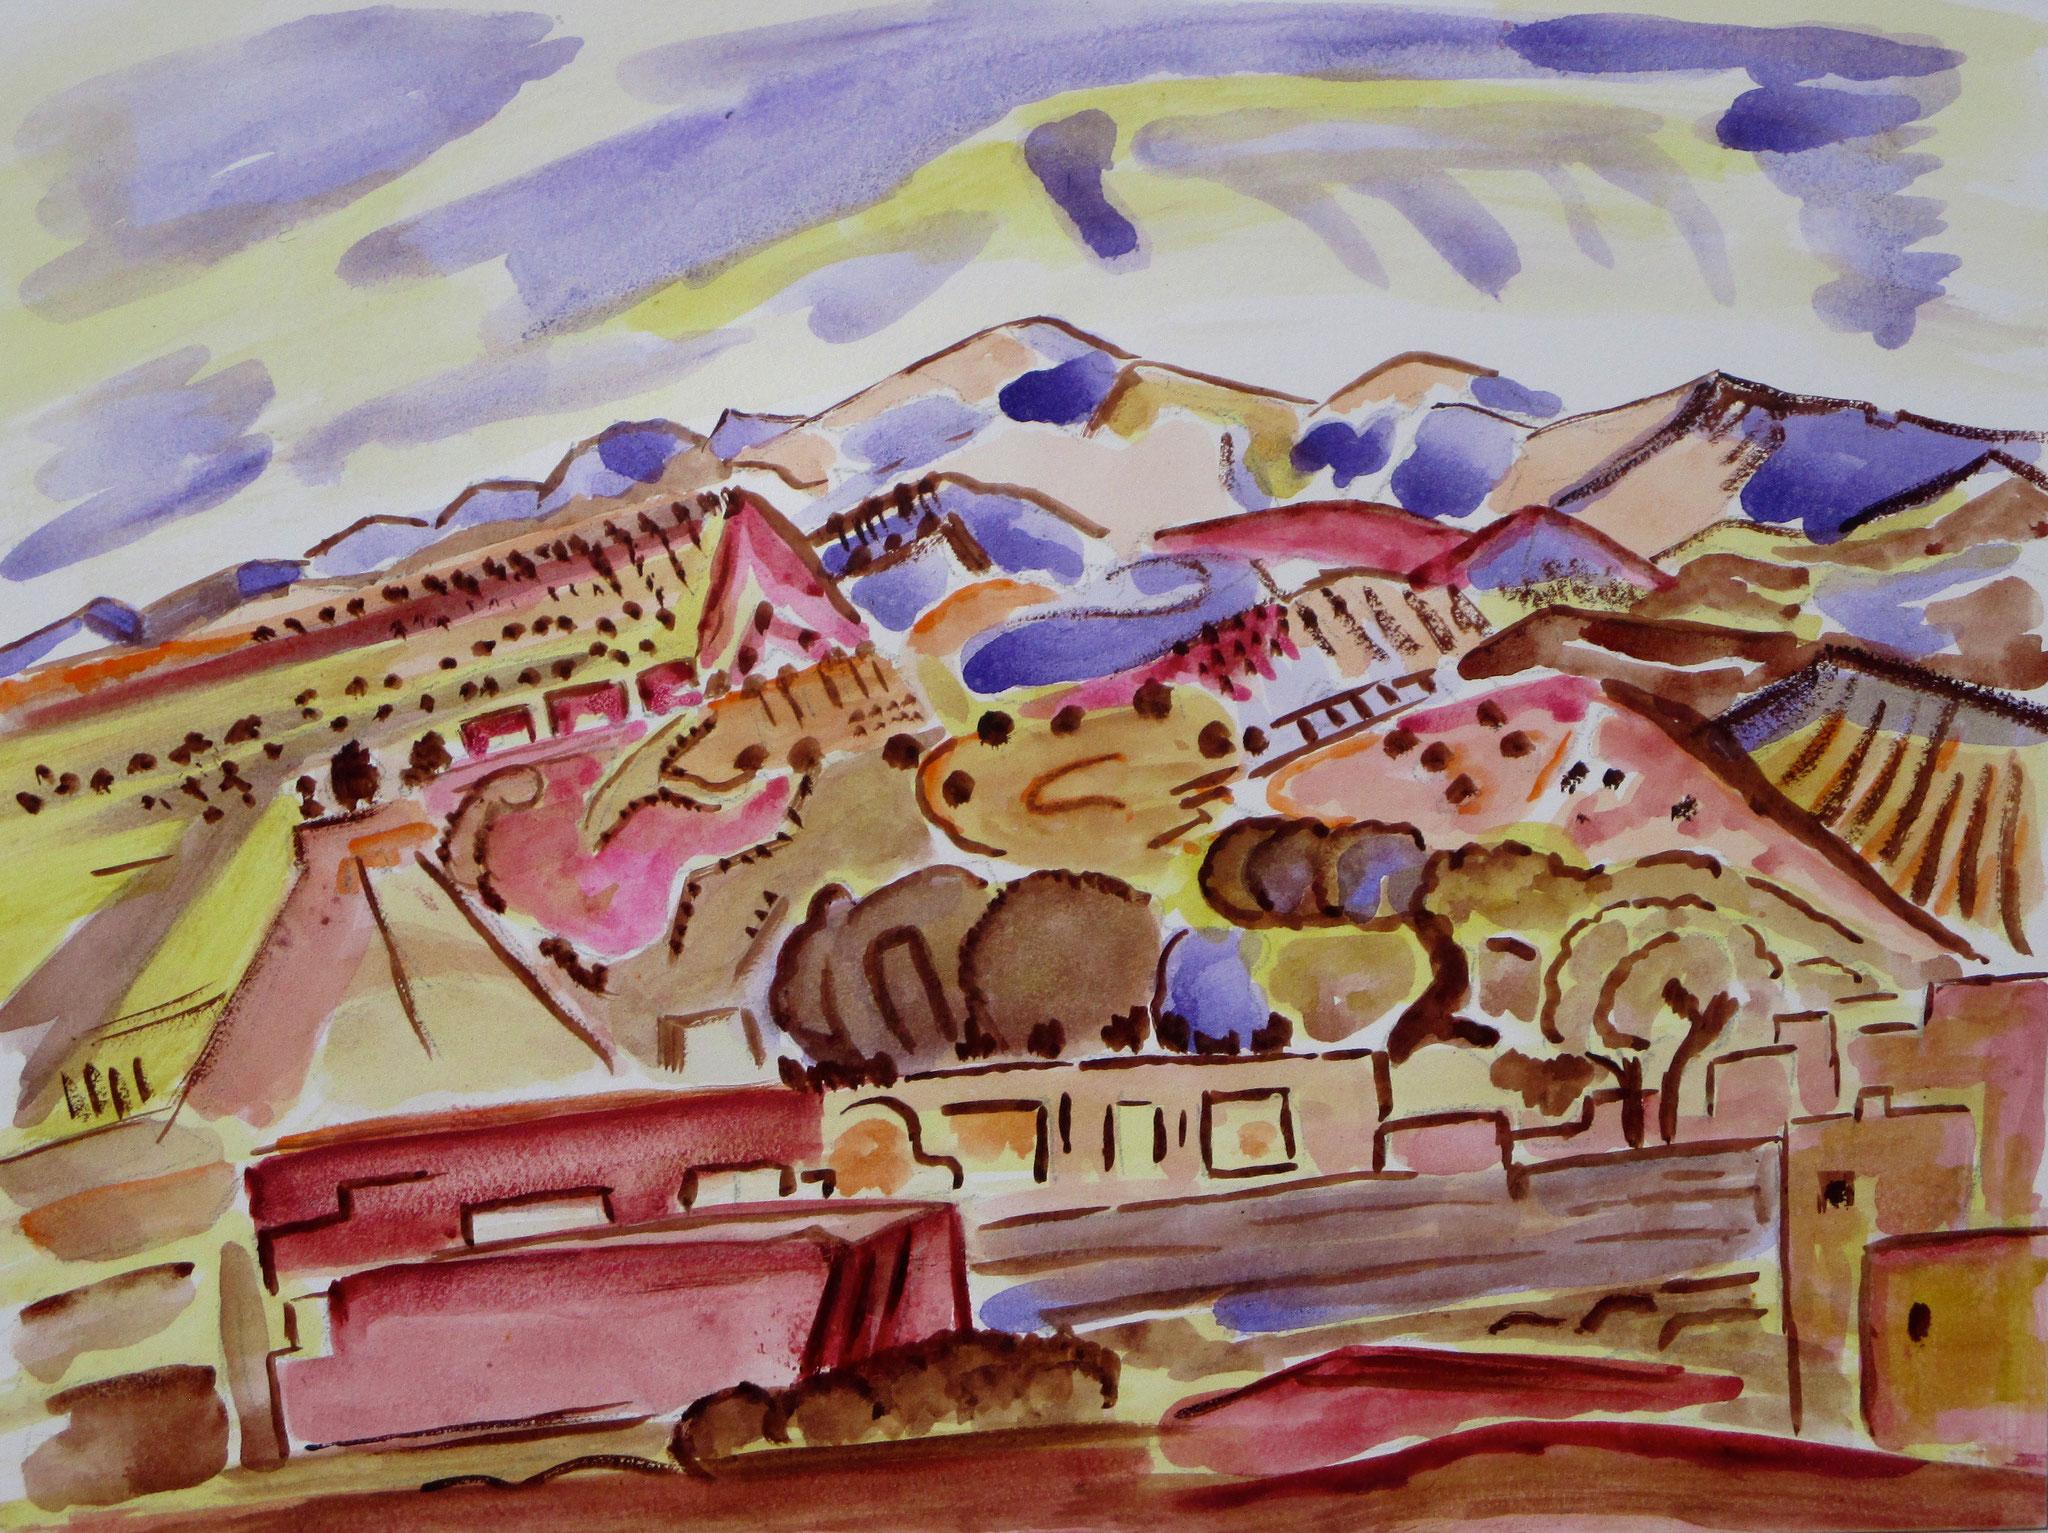 Lavender Skies, watercolor on board, 12 x 9, 2016 SOLD